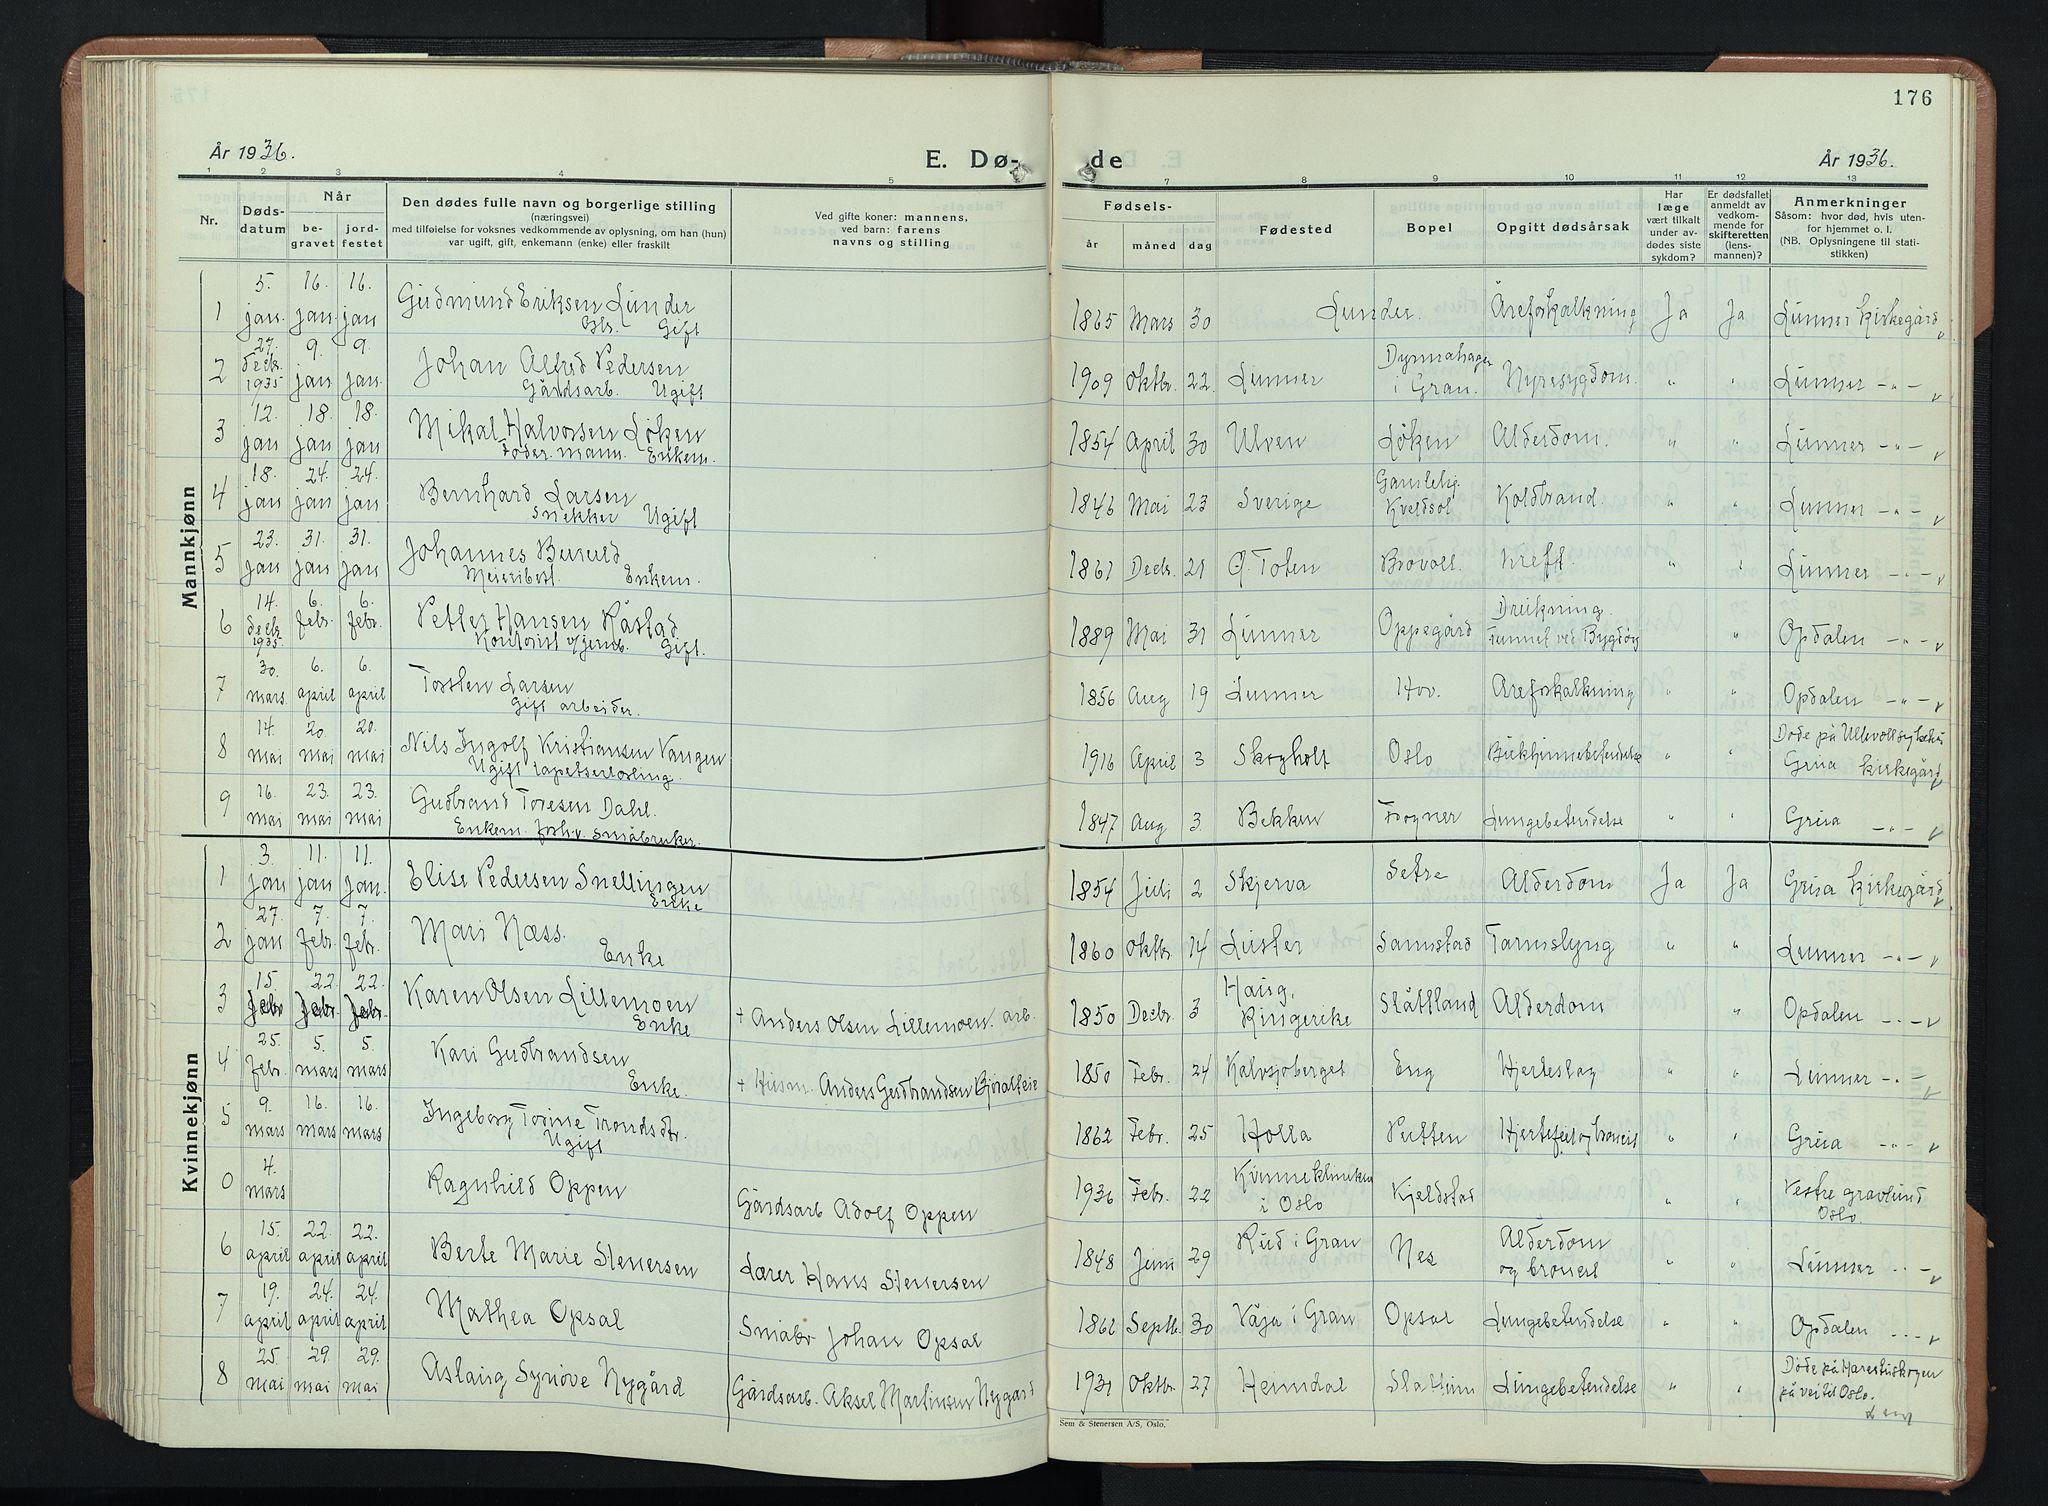 SAH, Lunner prestekontor, H/Ha/Hab/L0003: Klokkerbok nr. 3, 1933-1945, s. 176